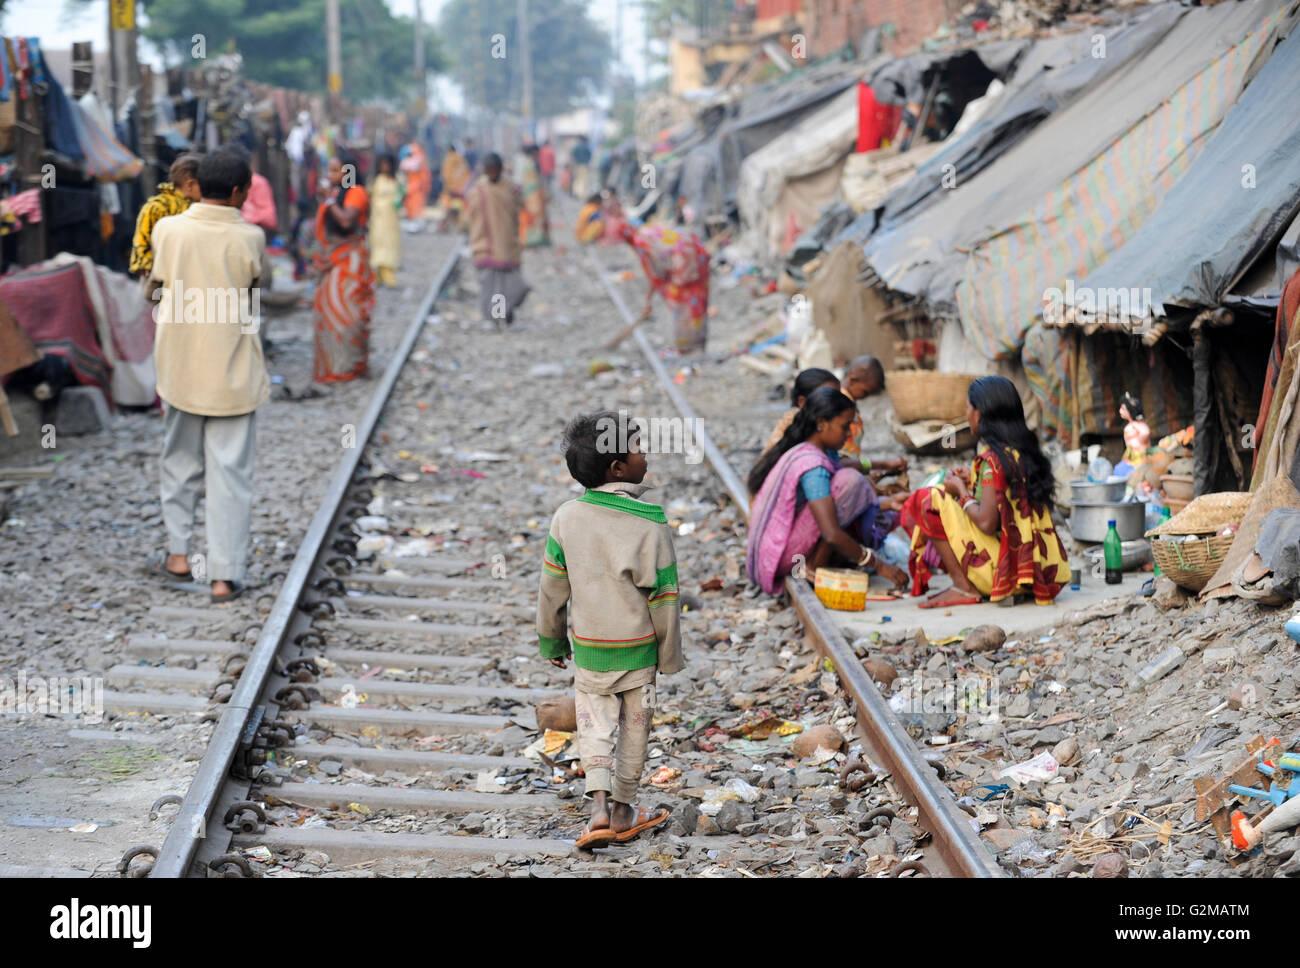 INDIA Westbengal, Kolkata, homeless people in tents at railway line / INDIEN, Westbengalen, Kolkata, obdachlose - Stock Image